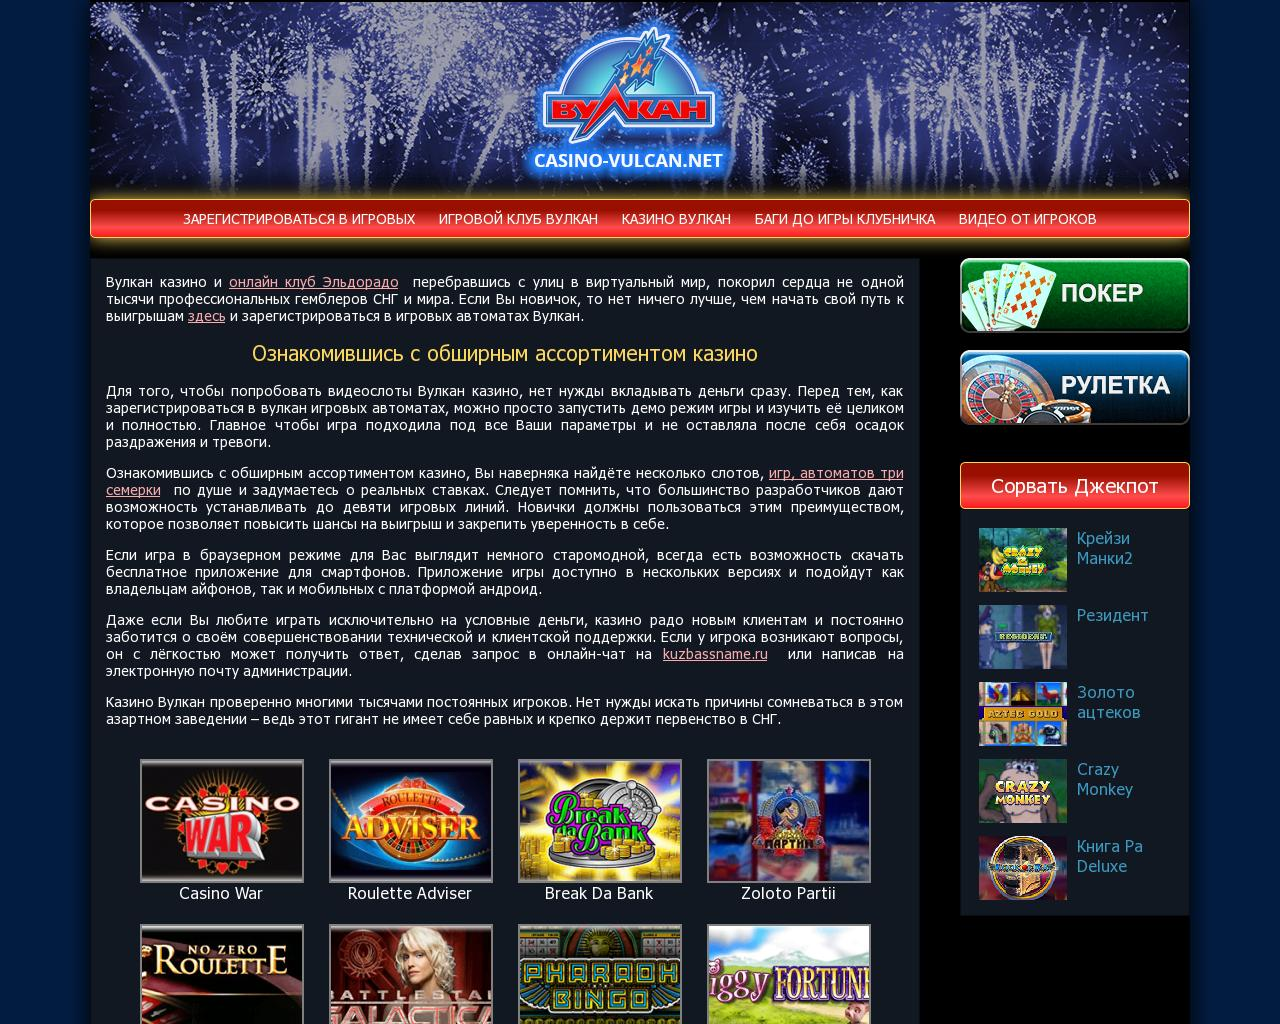 casino vulcan info